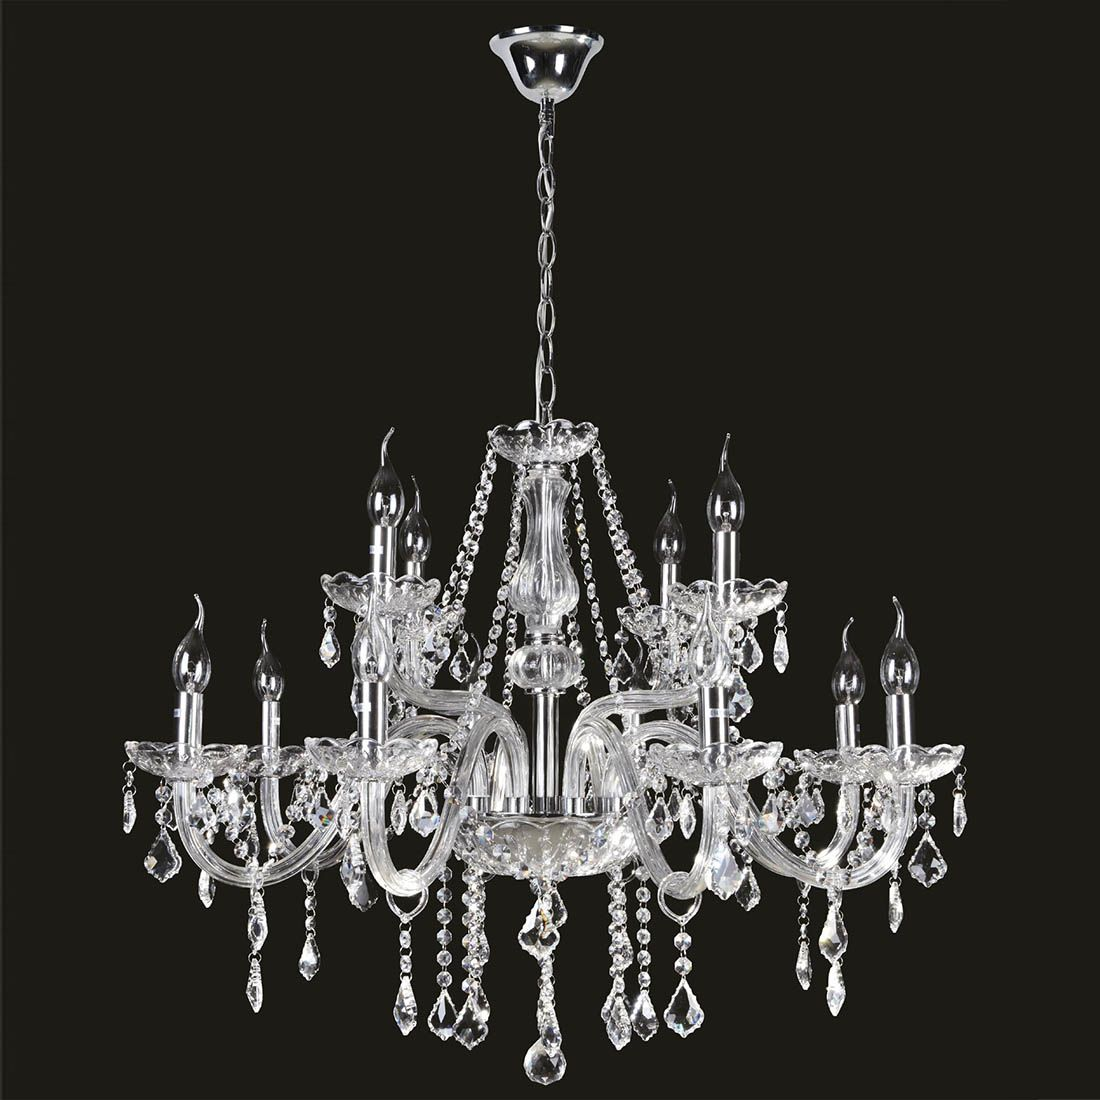 Lustre de Cristal Maria thereza 12 Braços Cristal Transparente BL